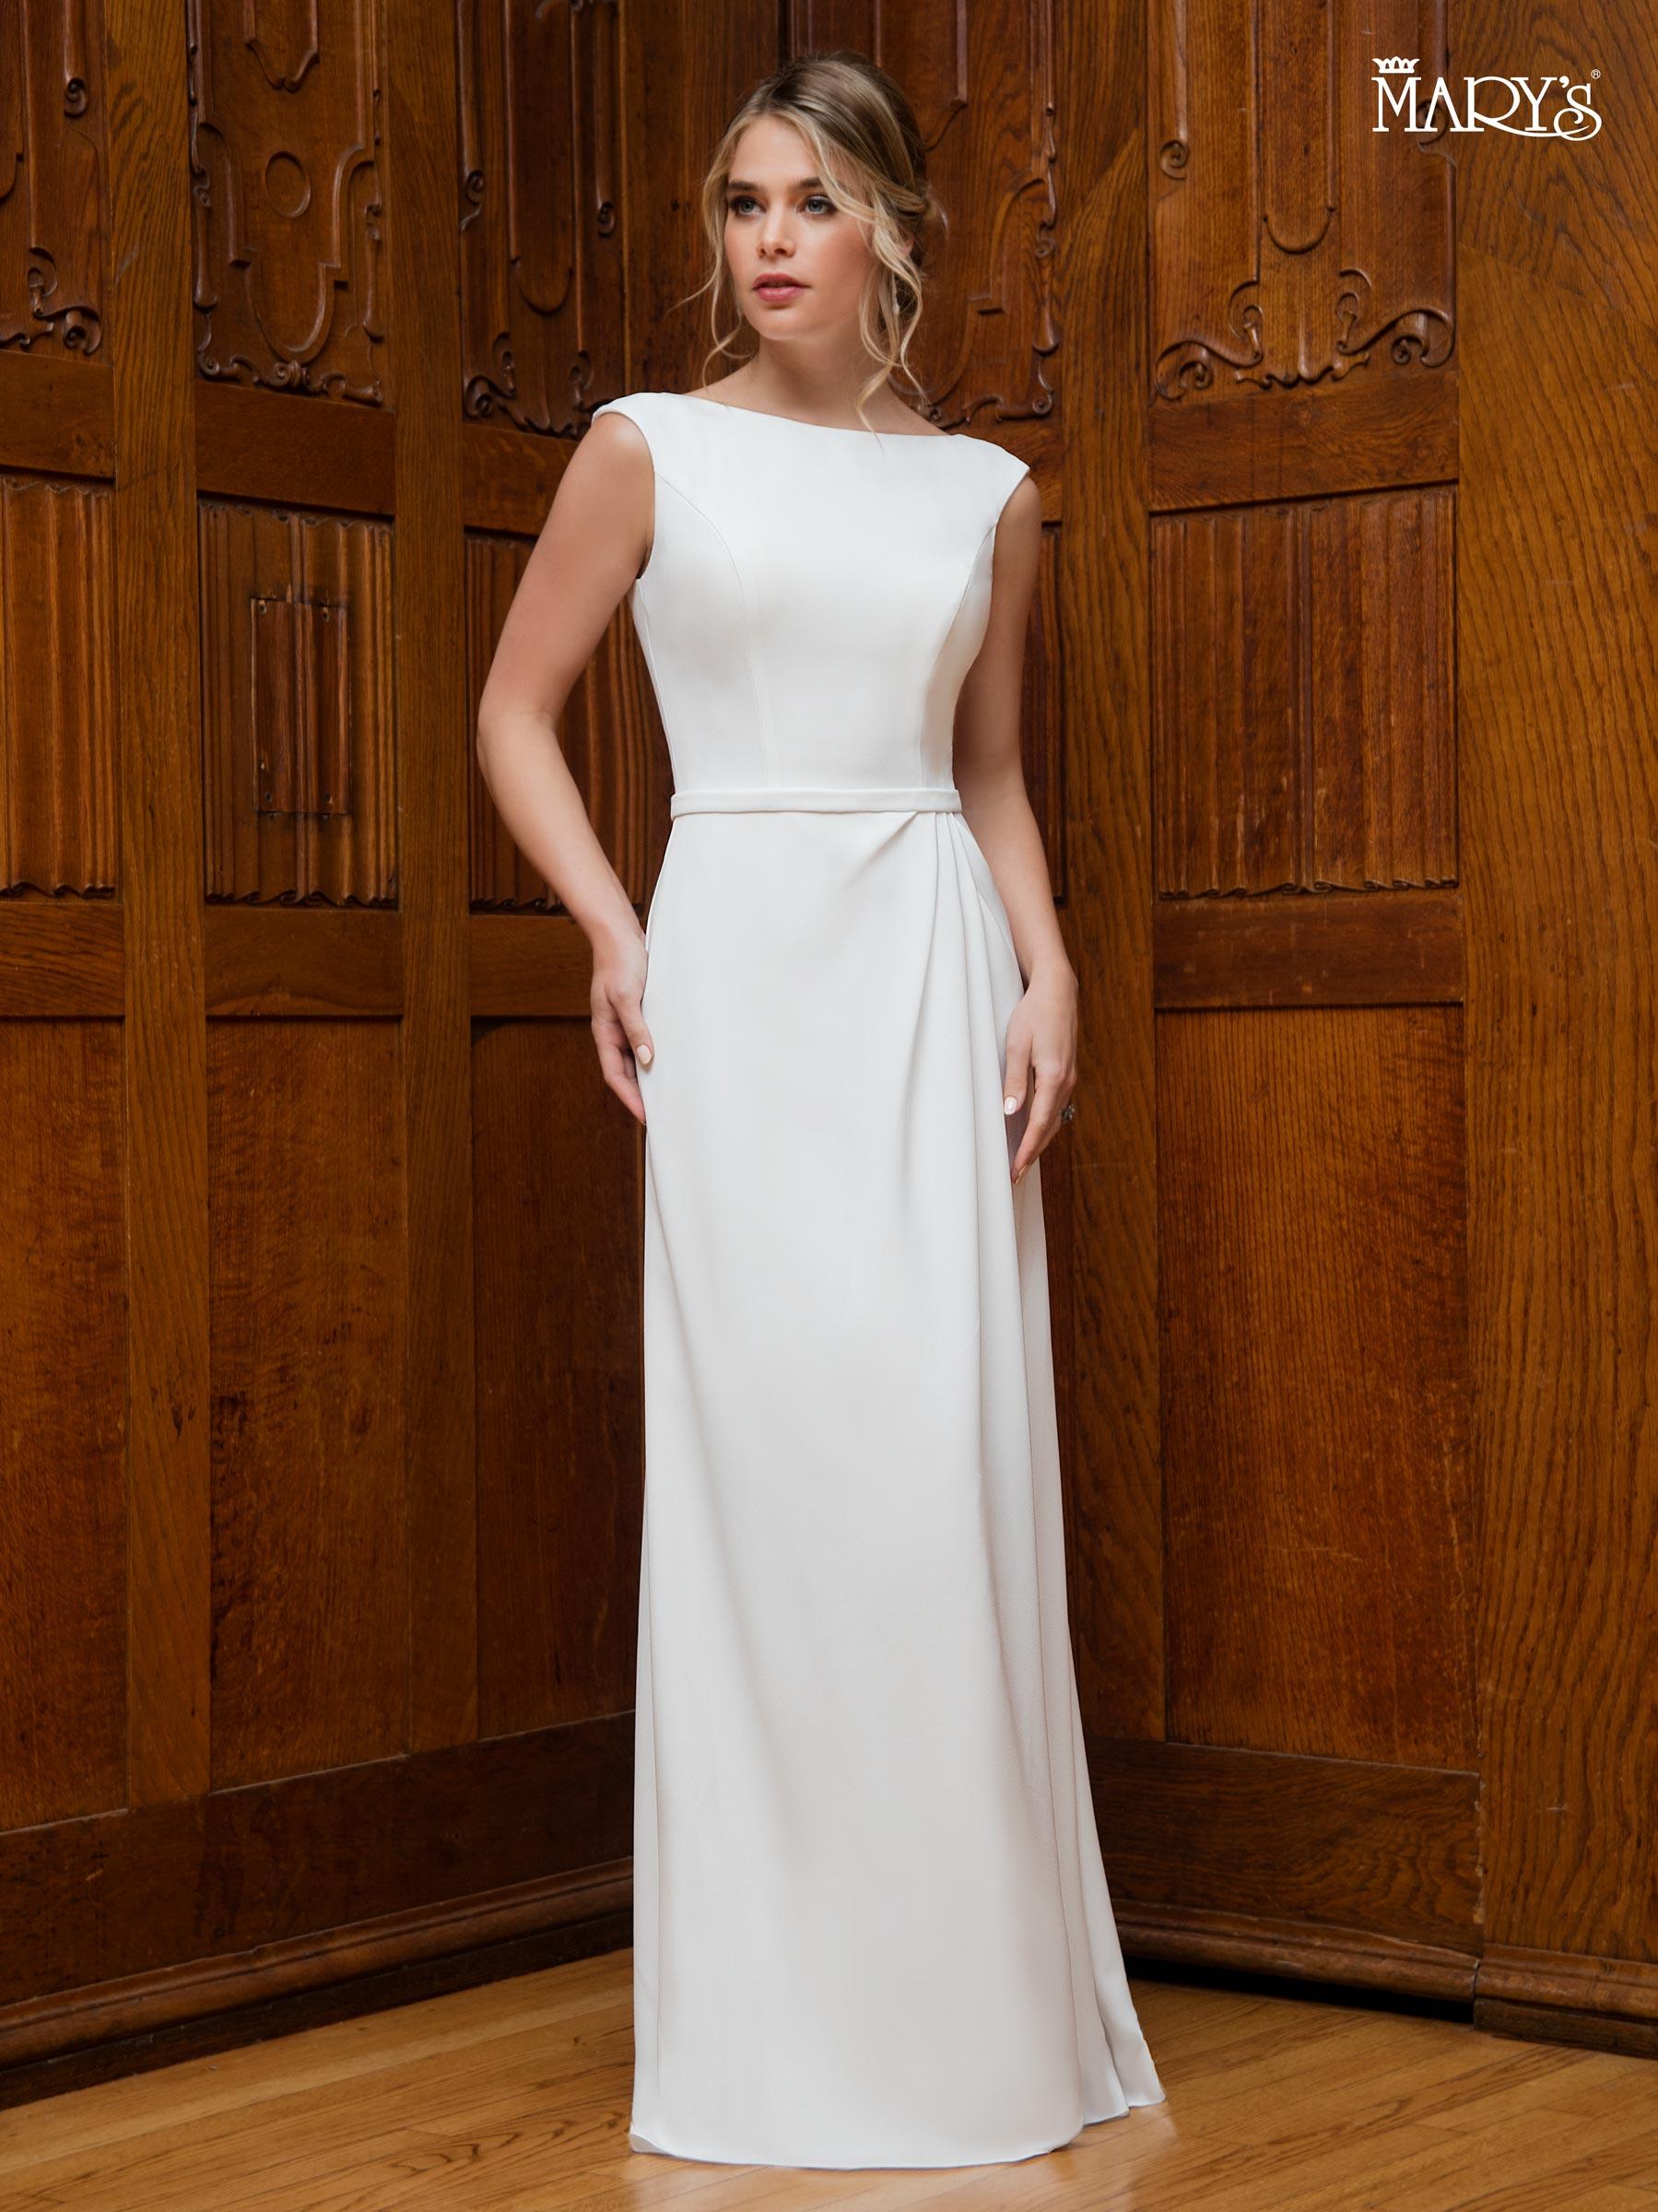 Bridal Wedding Dresses | Mary's | Style - MB1003